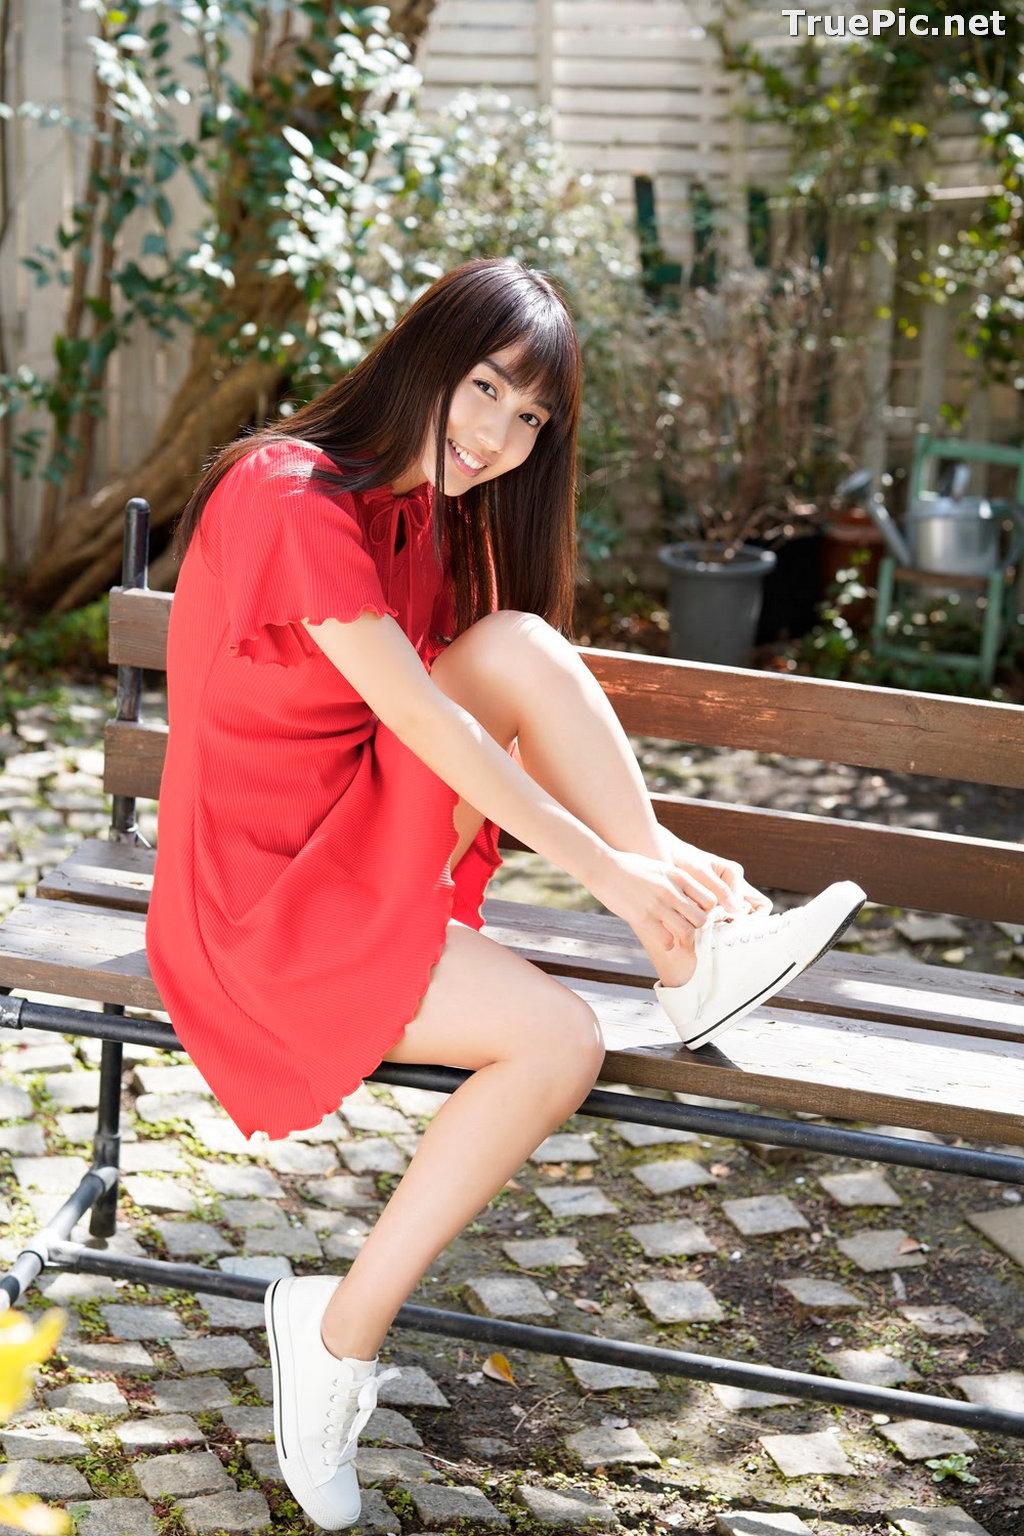 Image Japanese Actress and Model – Hikari Kuroki (黒木ひかり) – Sexy Picture Collection 2021 - TruePic.net - Picture-7